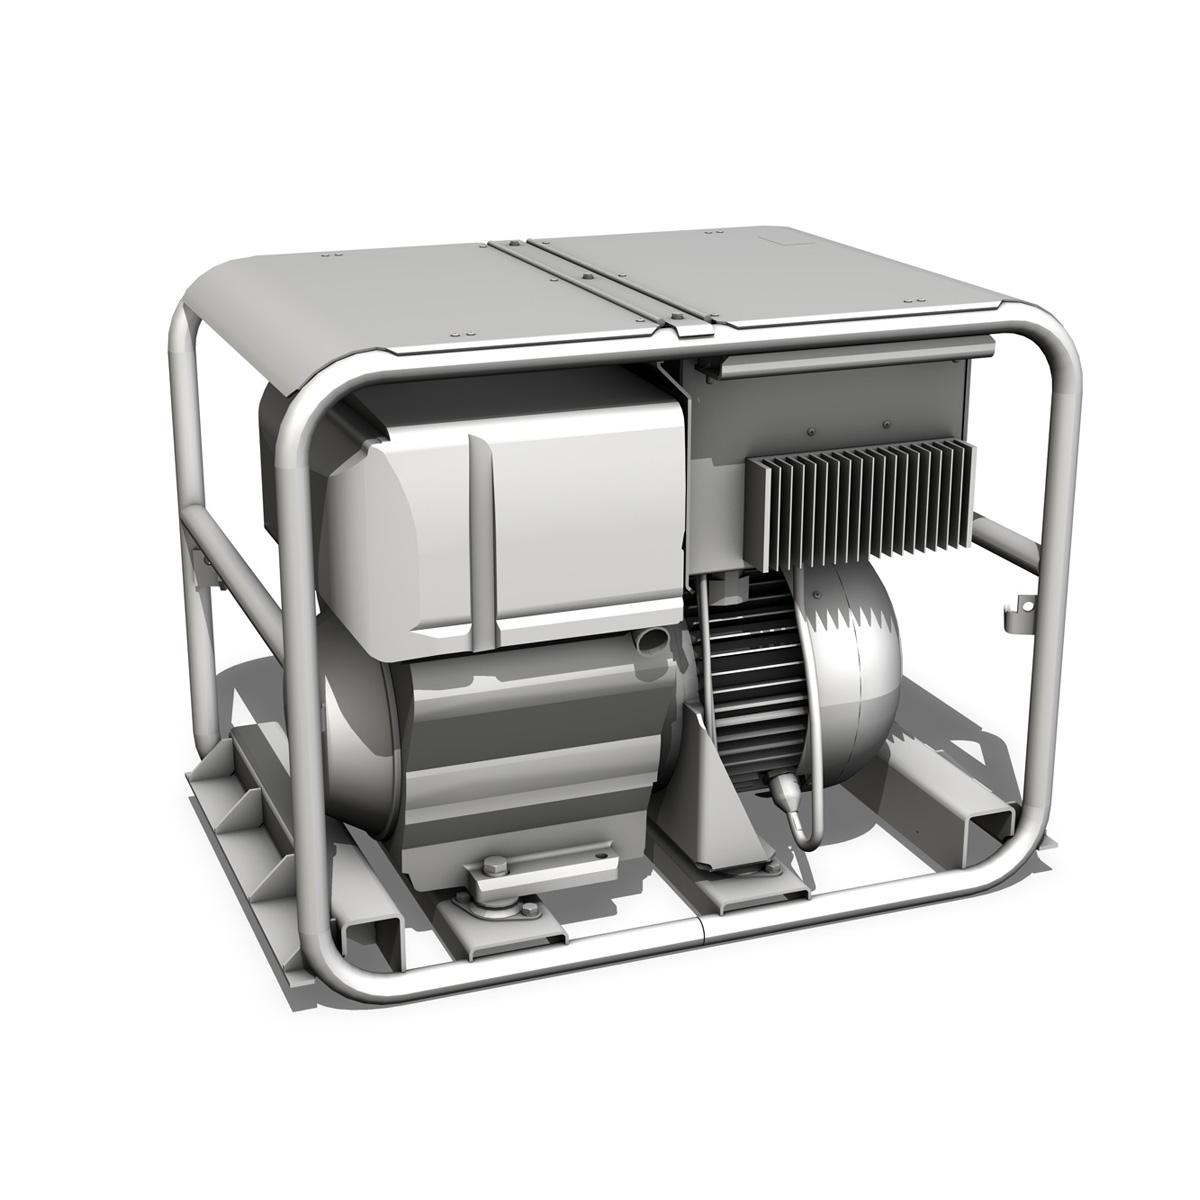 military diesel generator 3d model 3ds fbx c4d lwo obj 188563